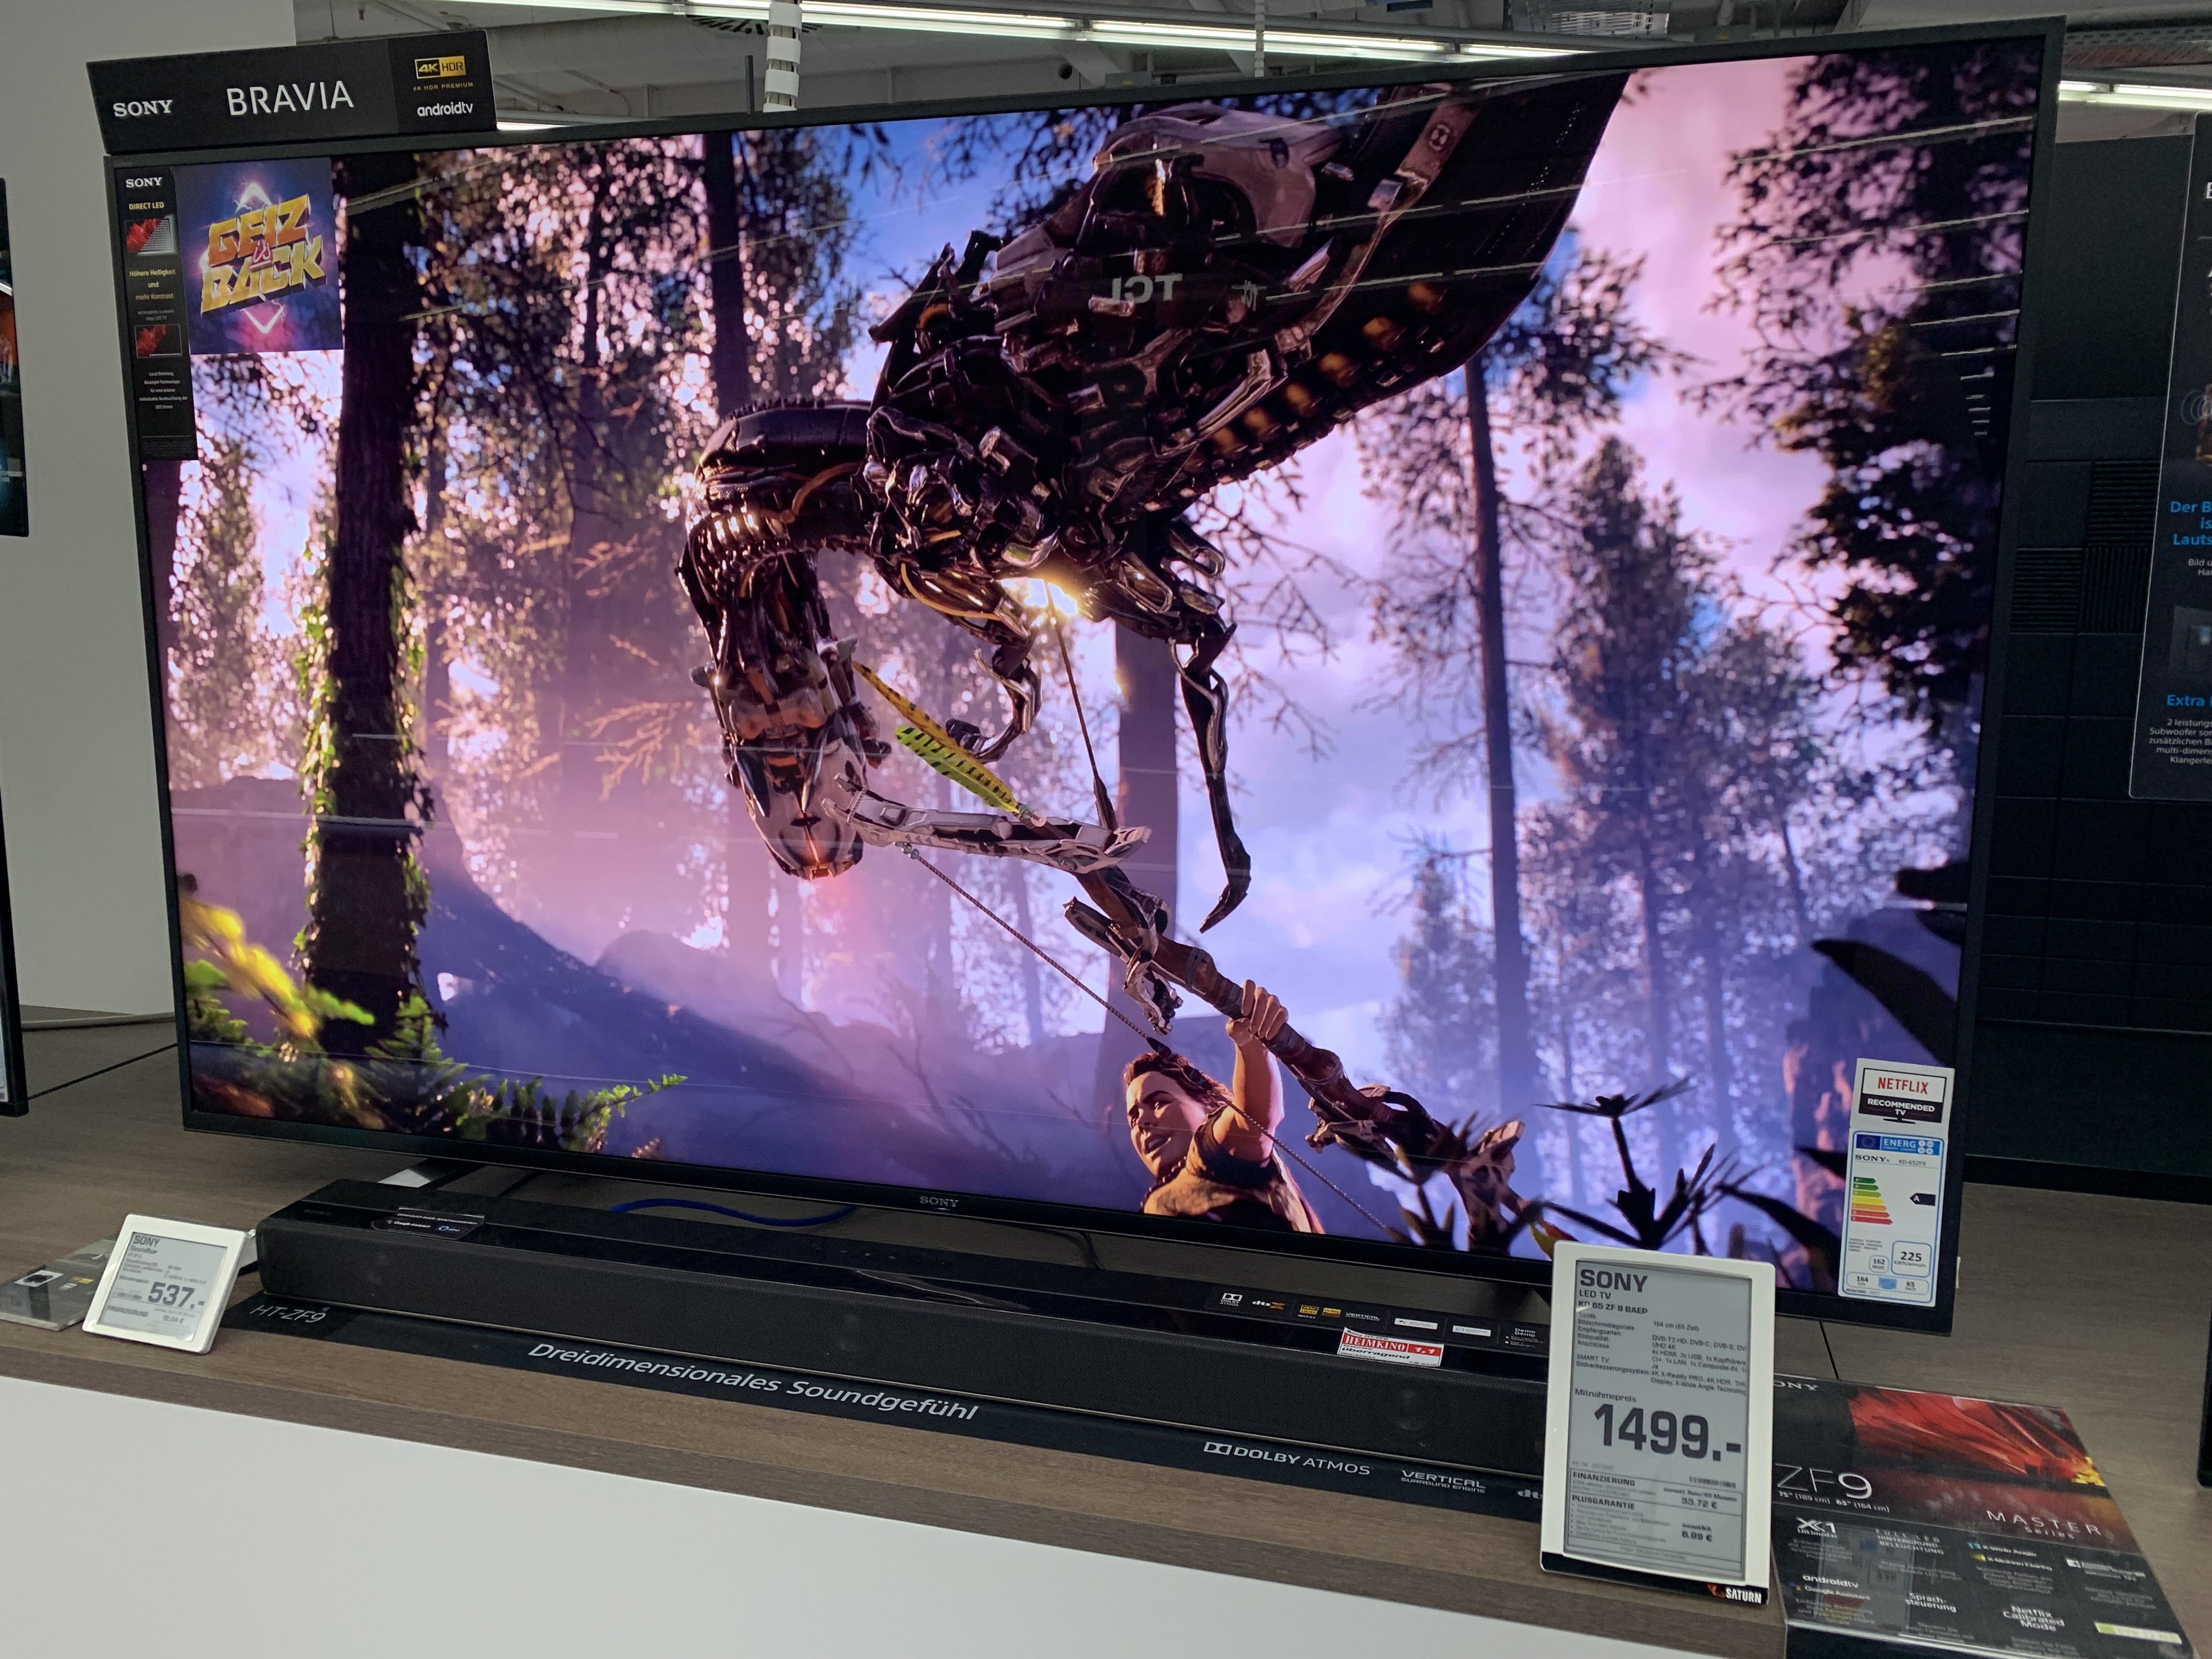 [lokal] Saturn Köln Maybach Str./ Sony LED TV KD65ZF9 für 1499€